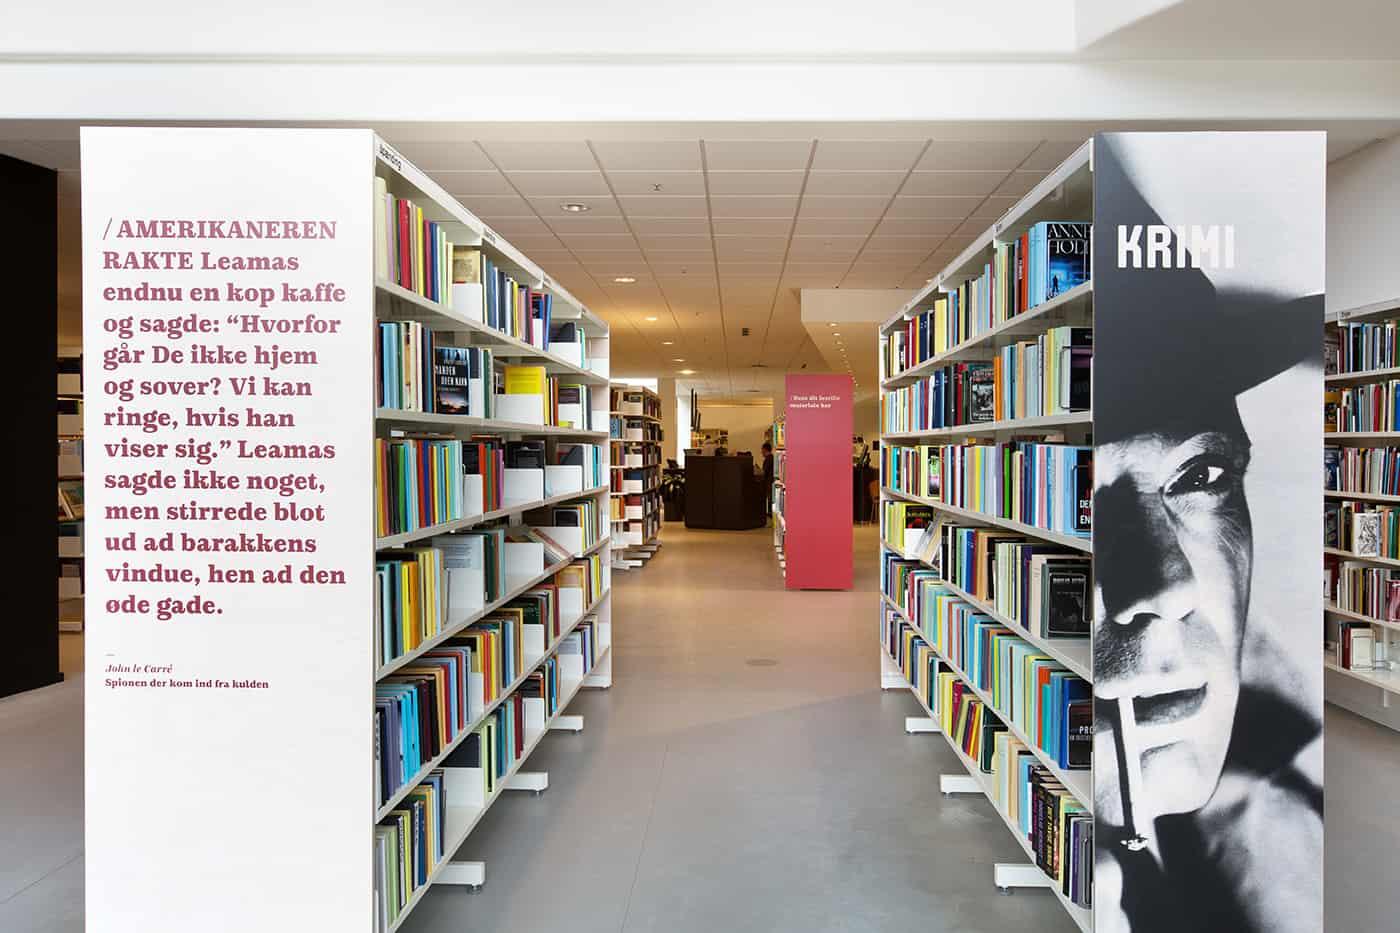 RITAarch, Indretning, spaceplanning, biblioteksdesign, biblioteksindretning, wayfinding, grafik, spaceplanning, arkitektur, bogreoler, Holbæk bibliotek